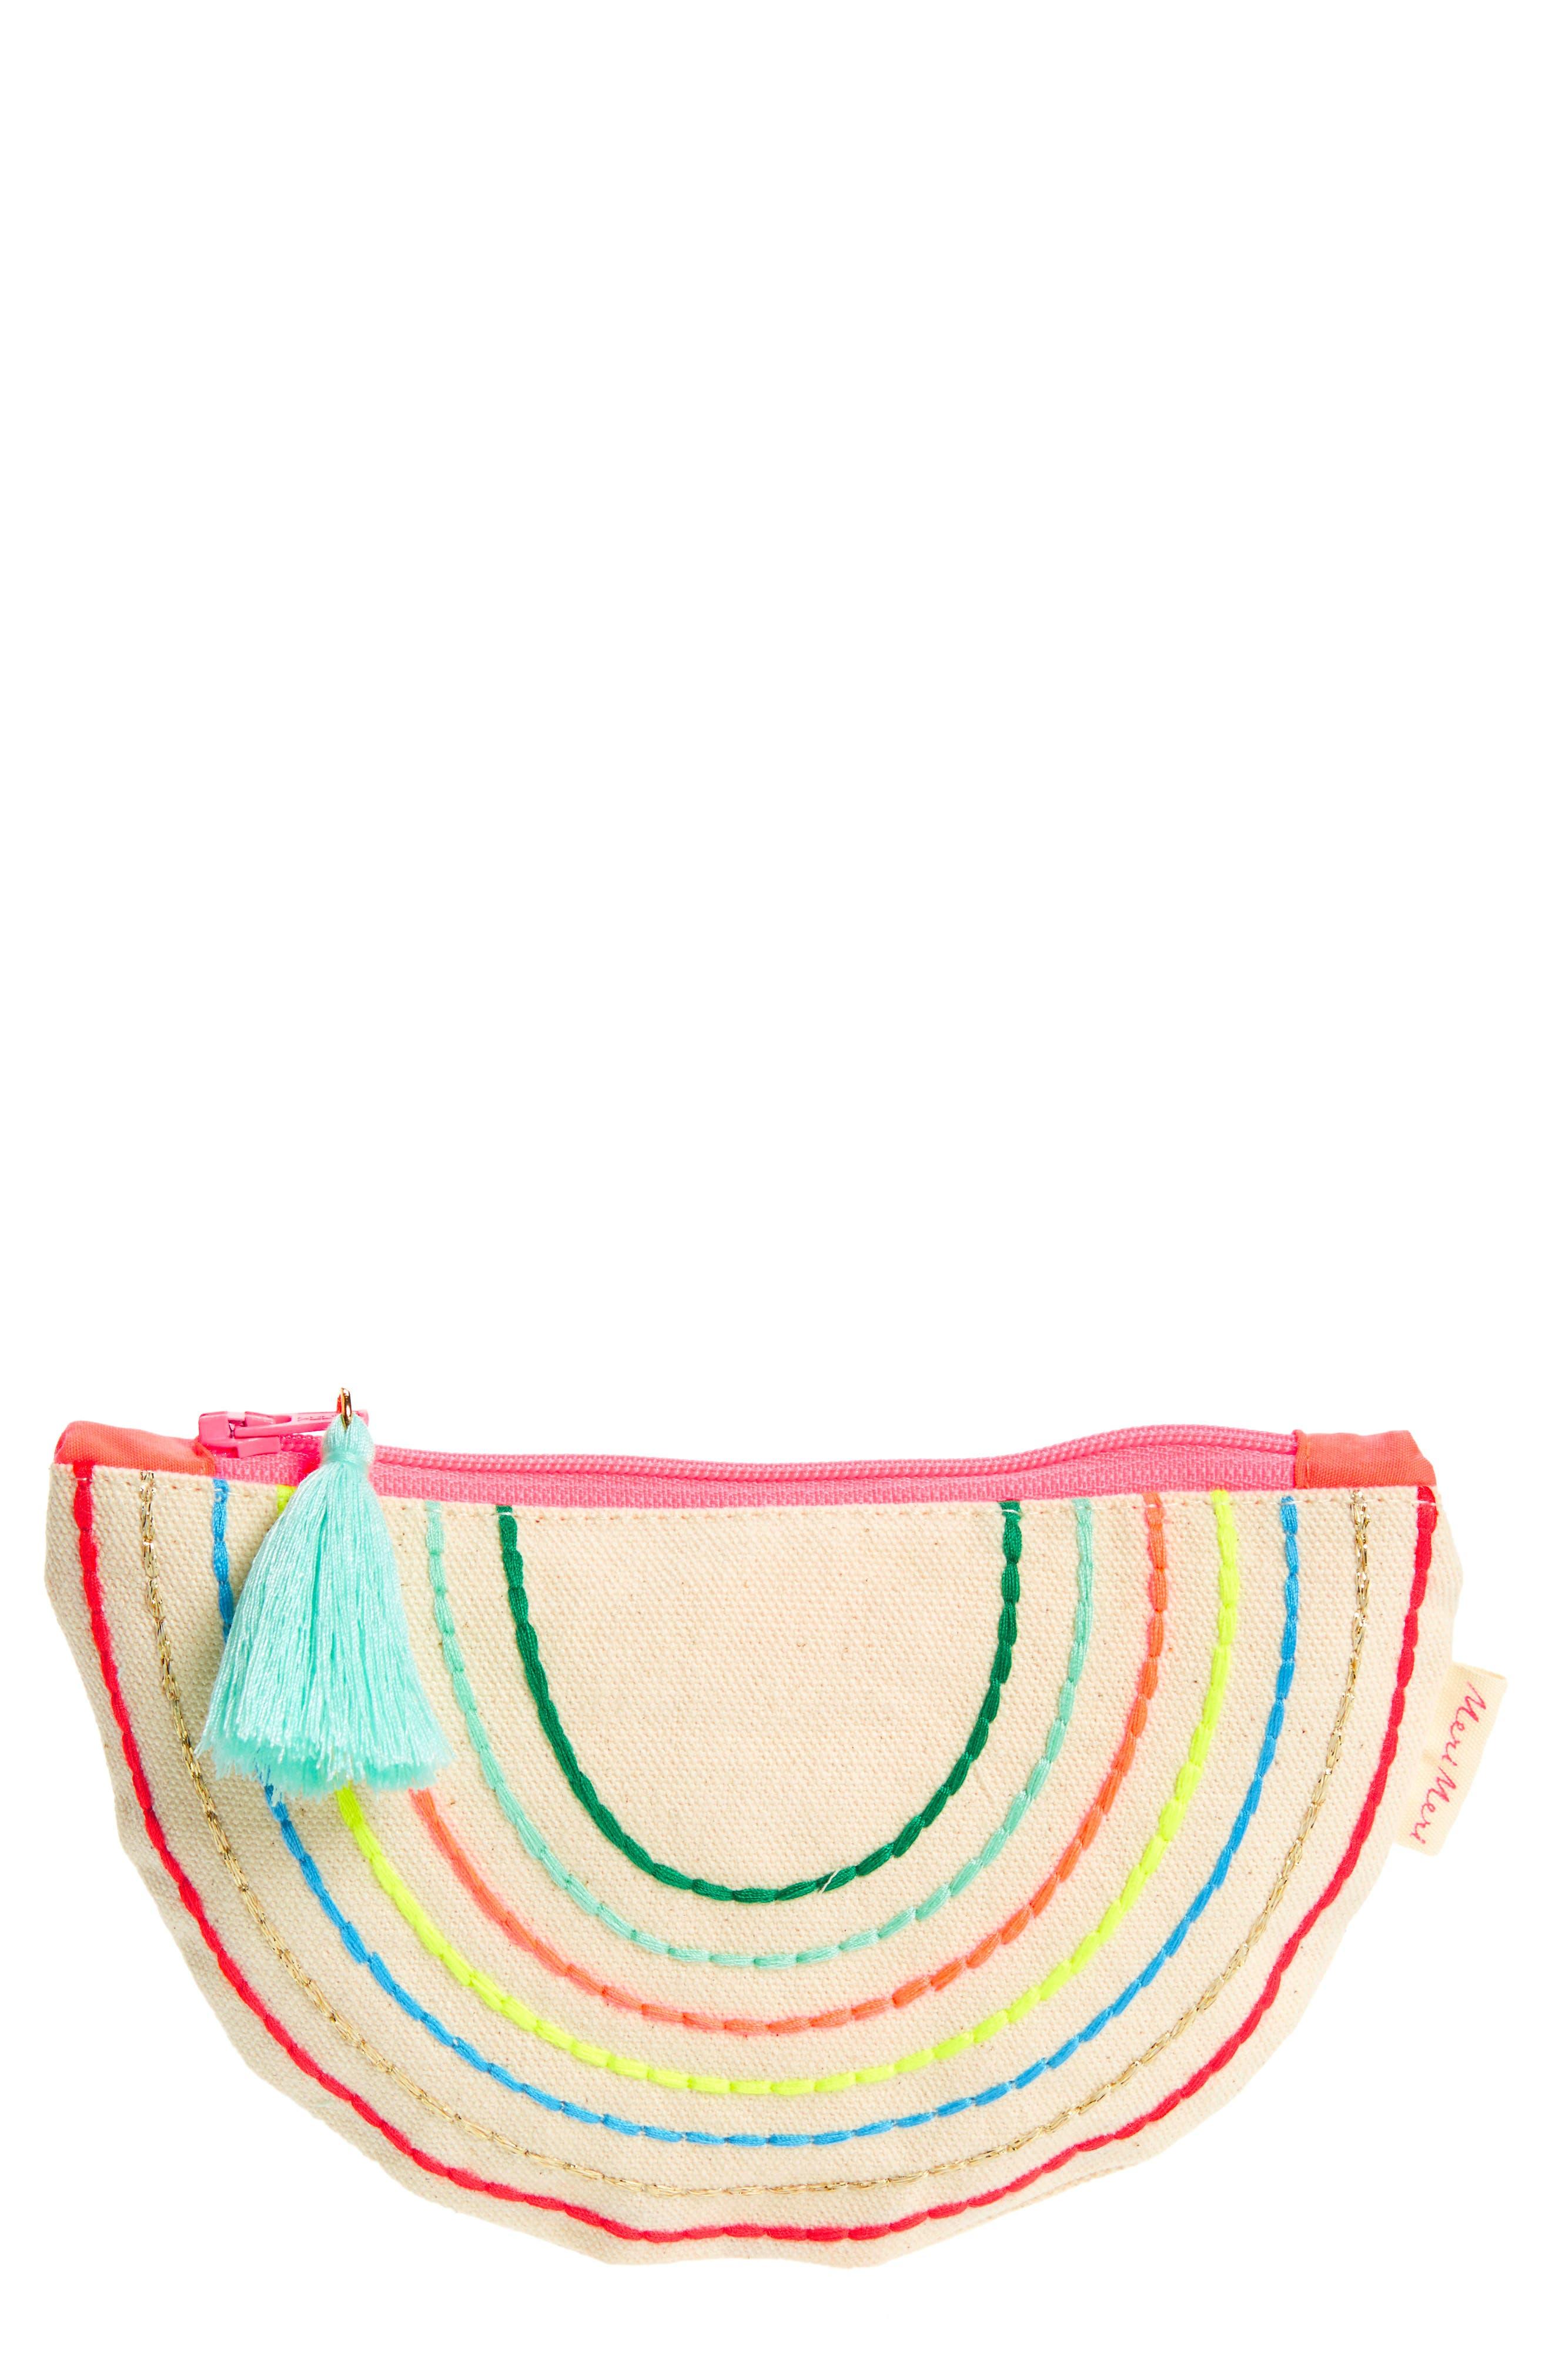 MERI MERI Rainbow Zip Pouch